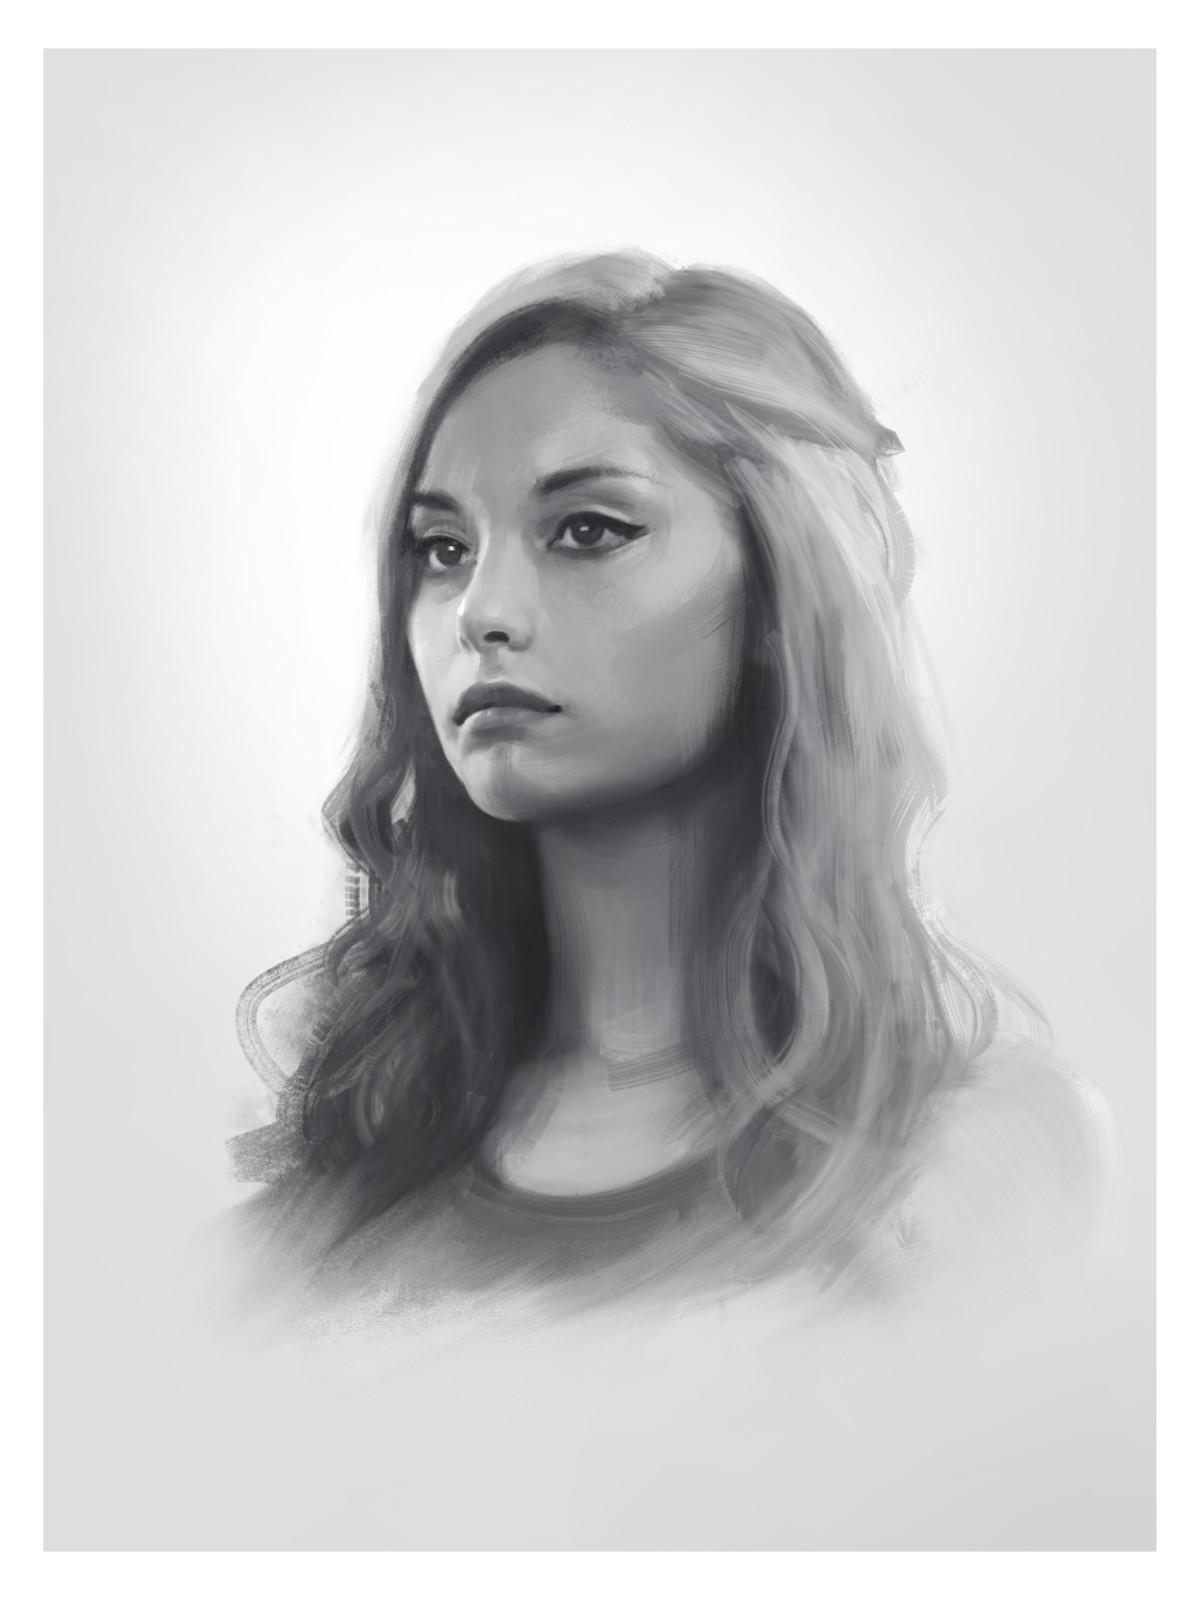 Ksenia Kravtsova